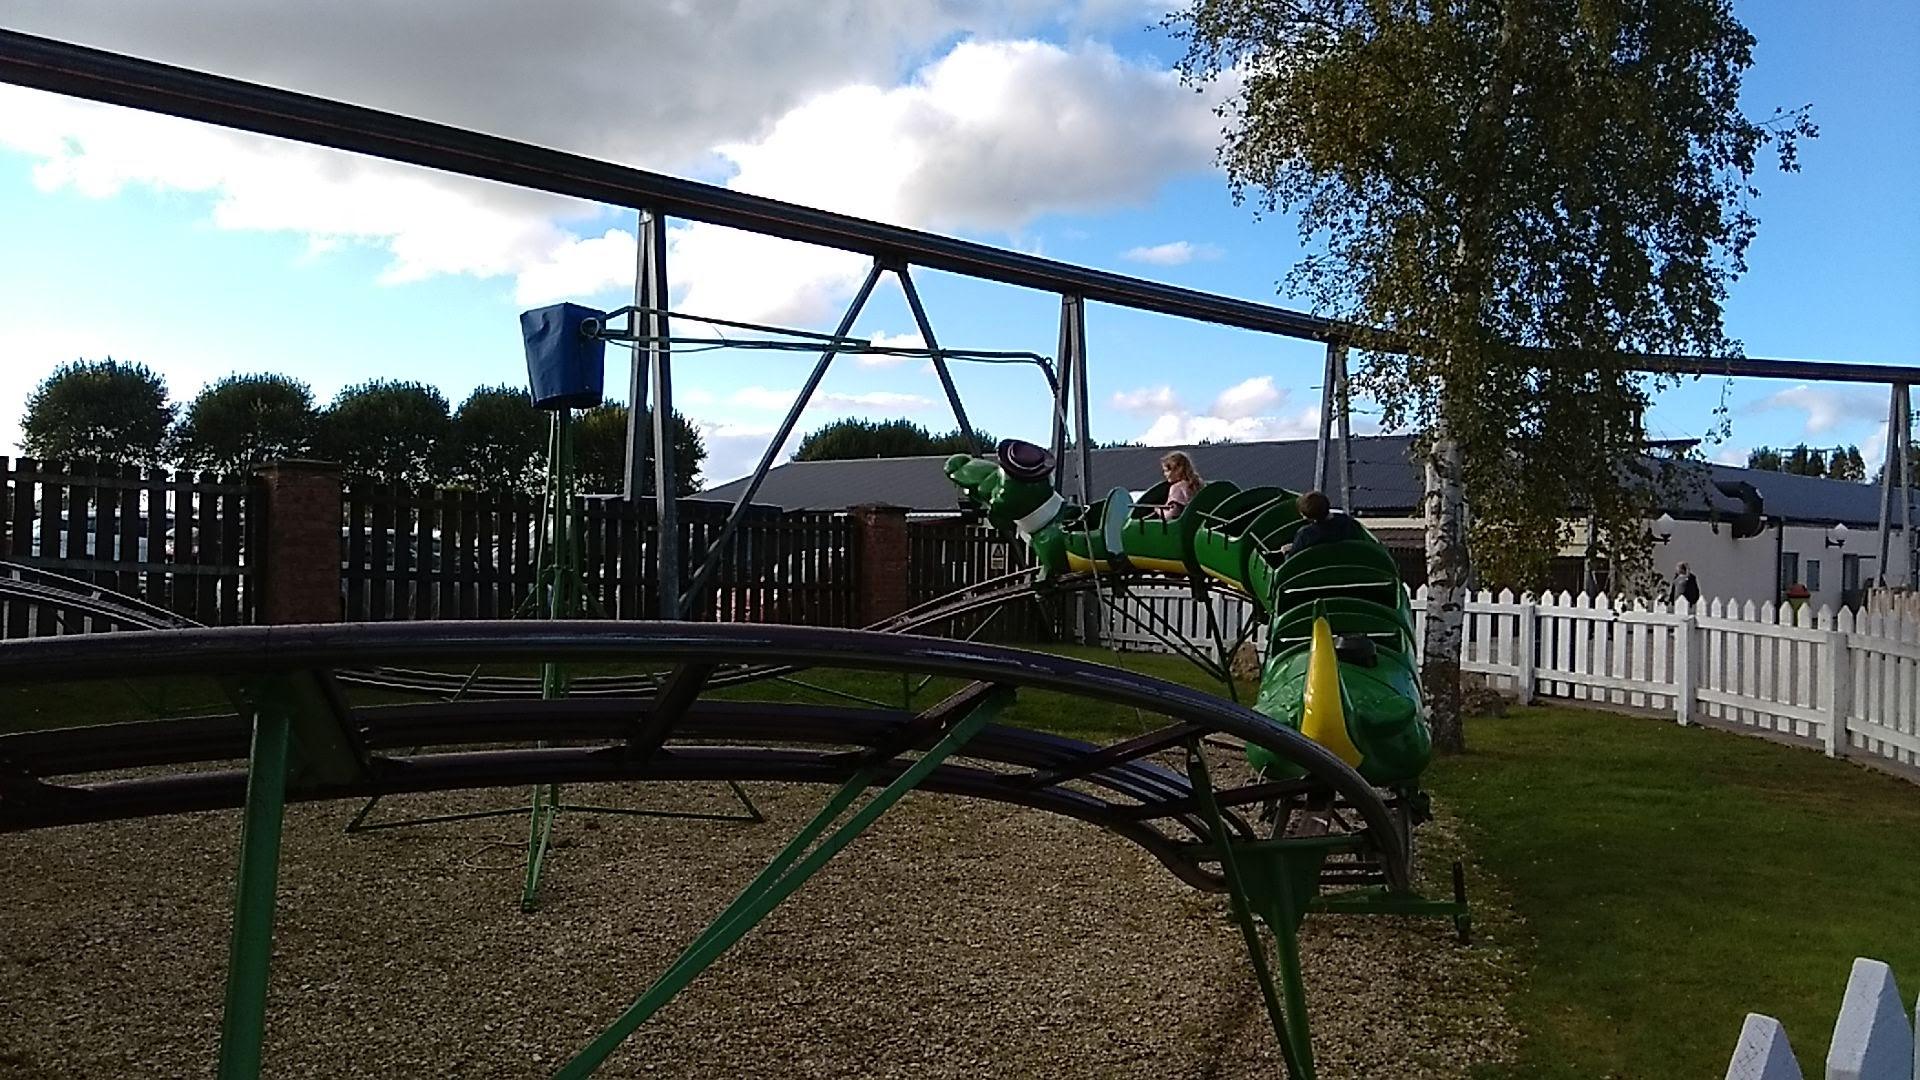 flamingo land theme park yorkshire (19)